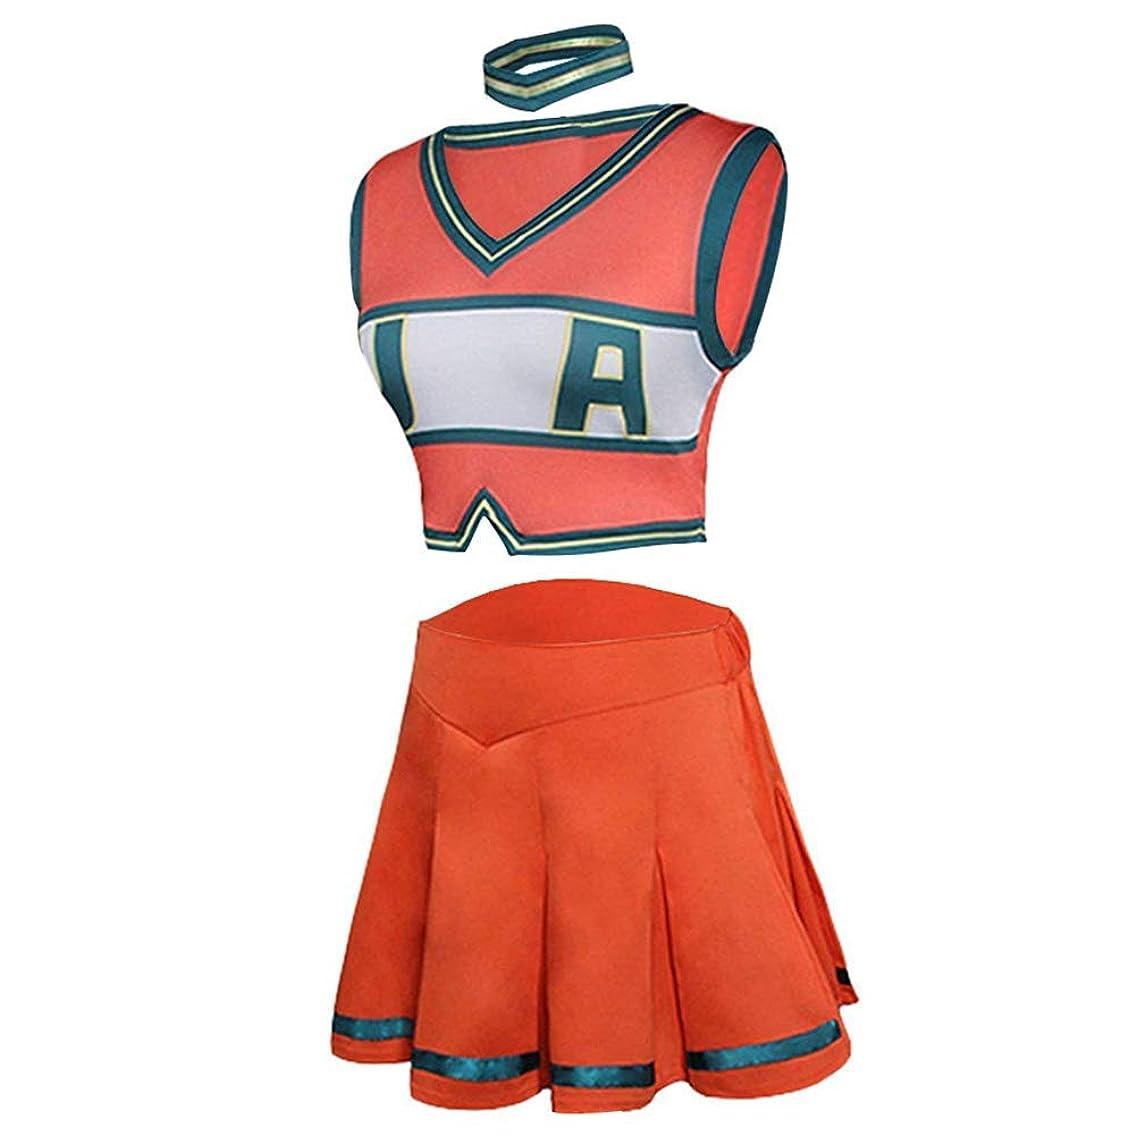 NoveltyBoy Boku No Hero Academia My Hero Academia Asui Tsuyu Cosplay Costume Cheerleader Cheerleading Uniform